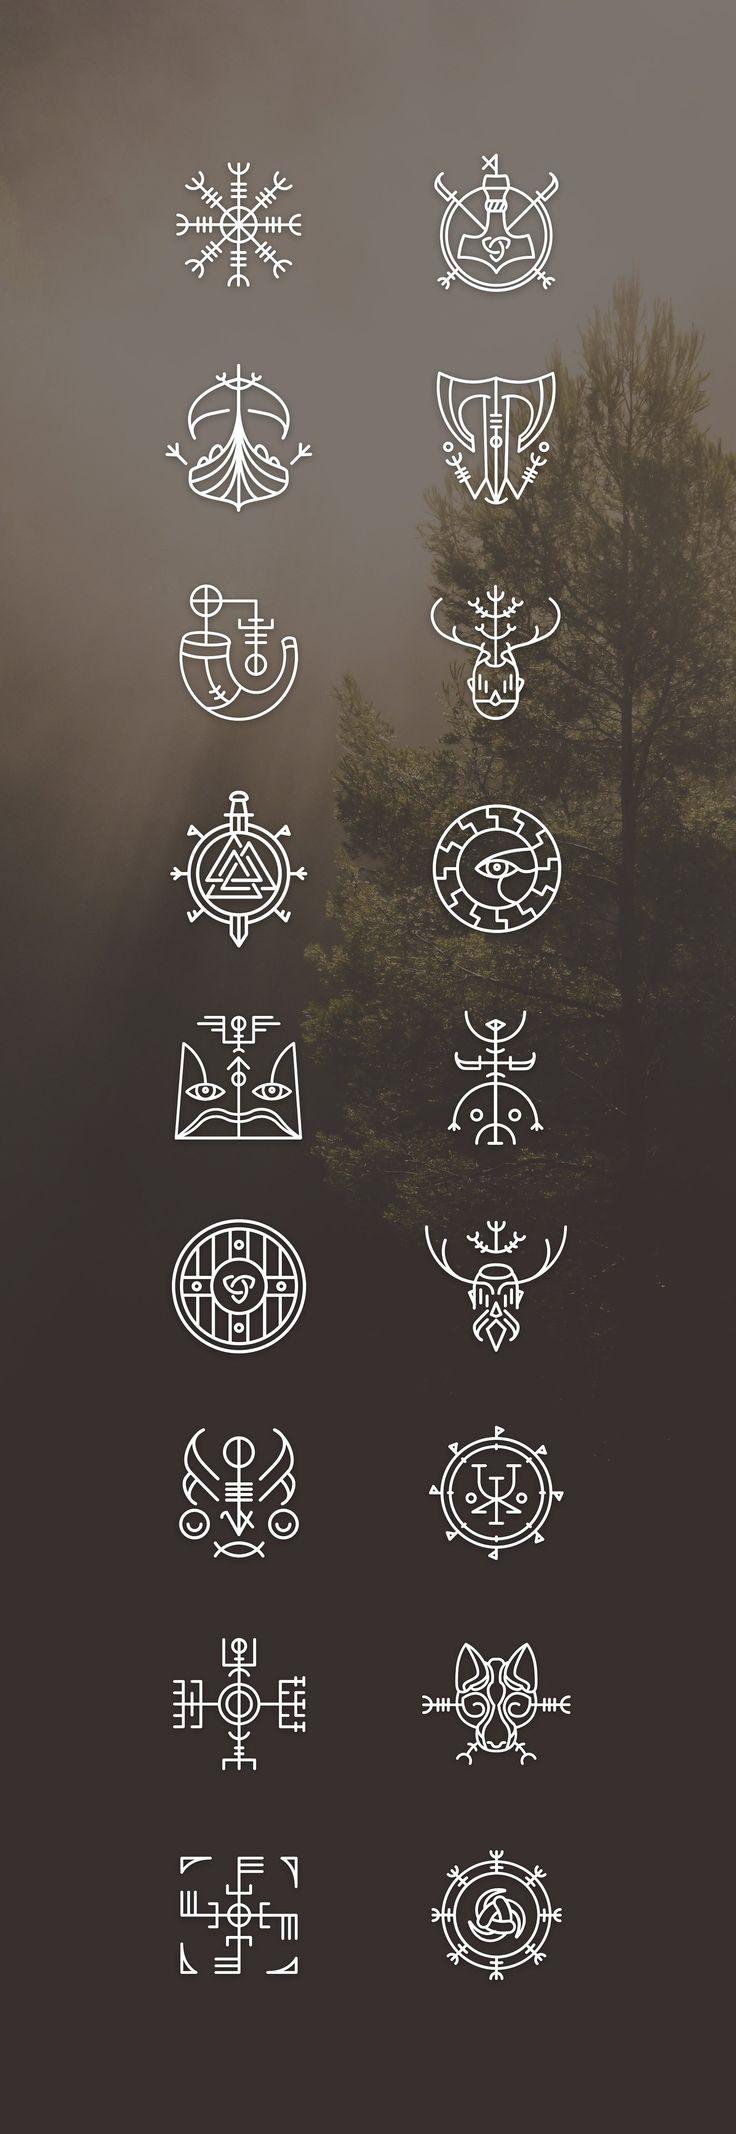 Vikons: the Striking #Viking #icon set by blanaroo…